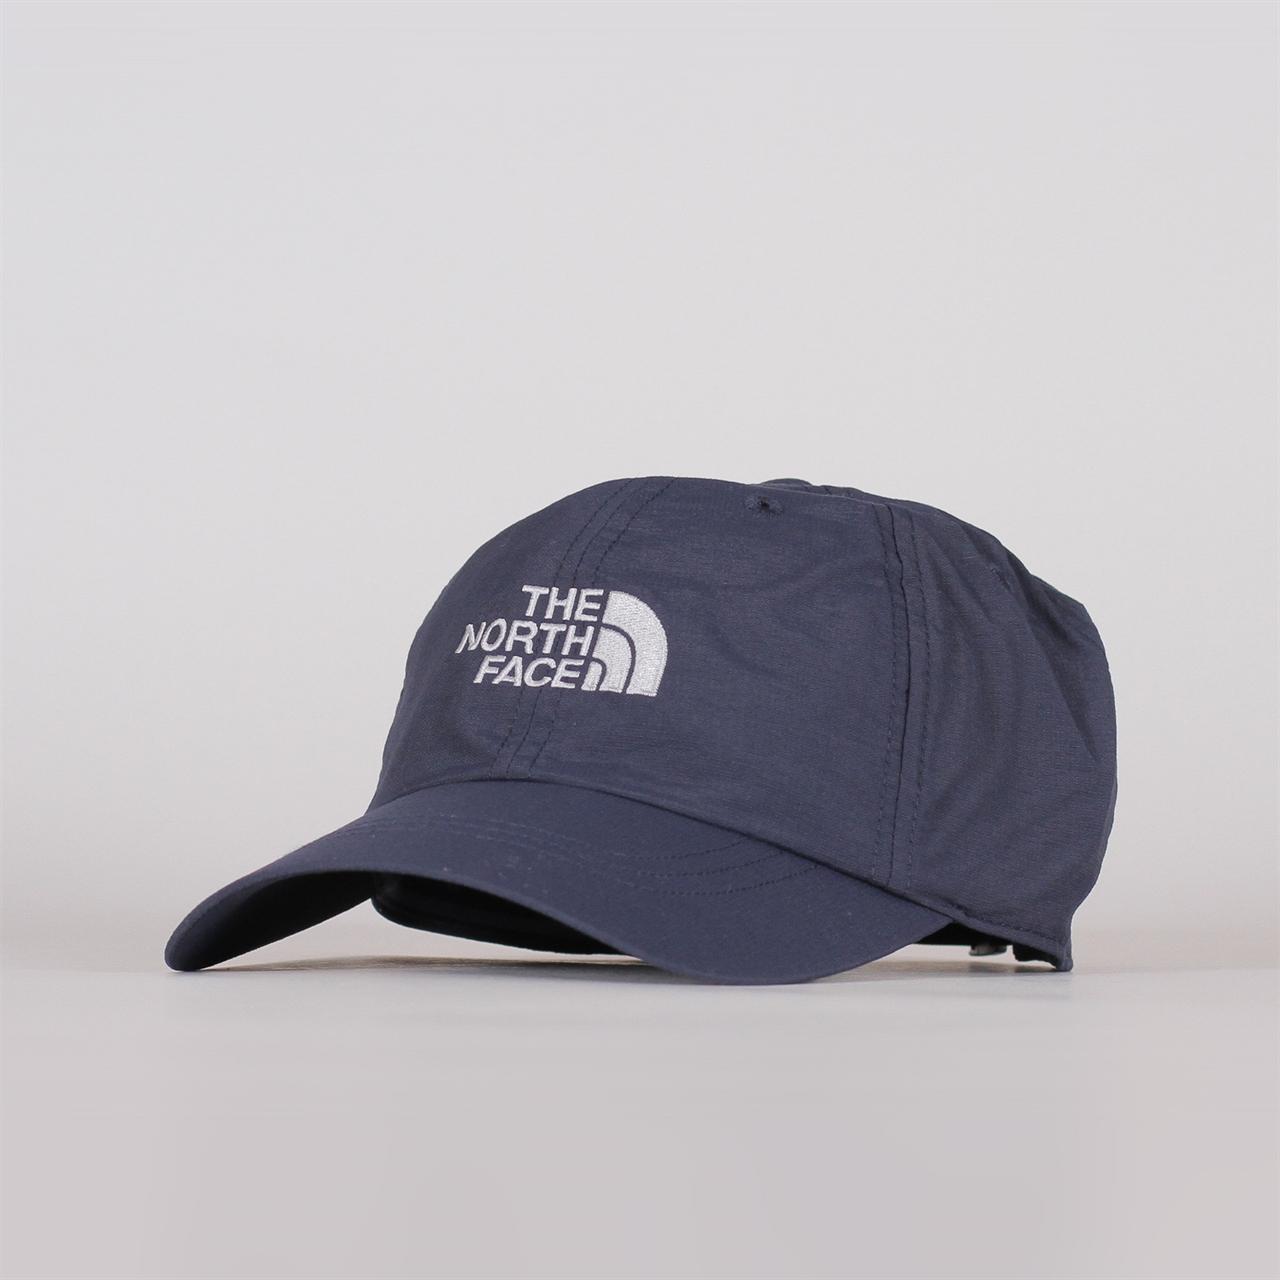 69cfde061f0a12 The North Face Horizon Ball Cap Navy (T0CF7WULB) - Shelta